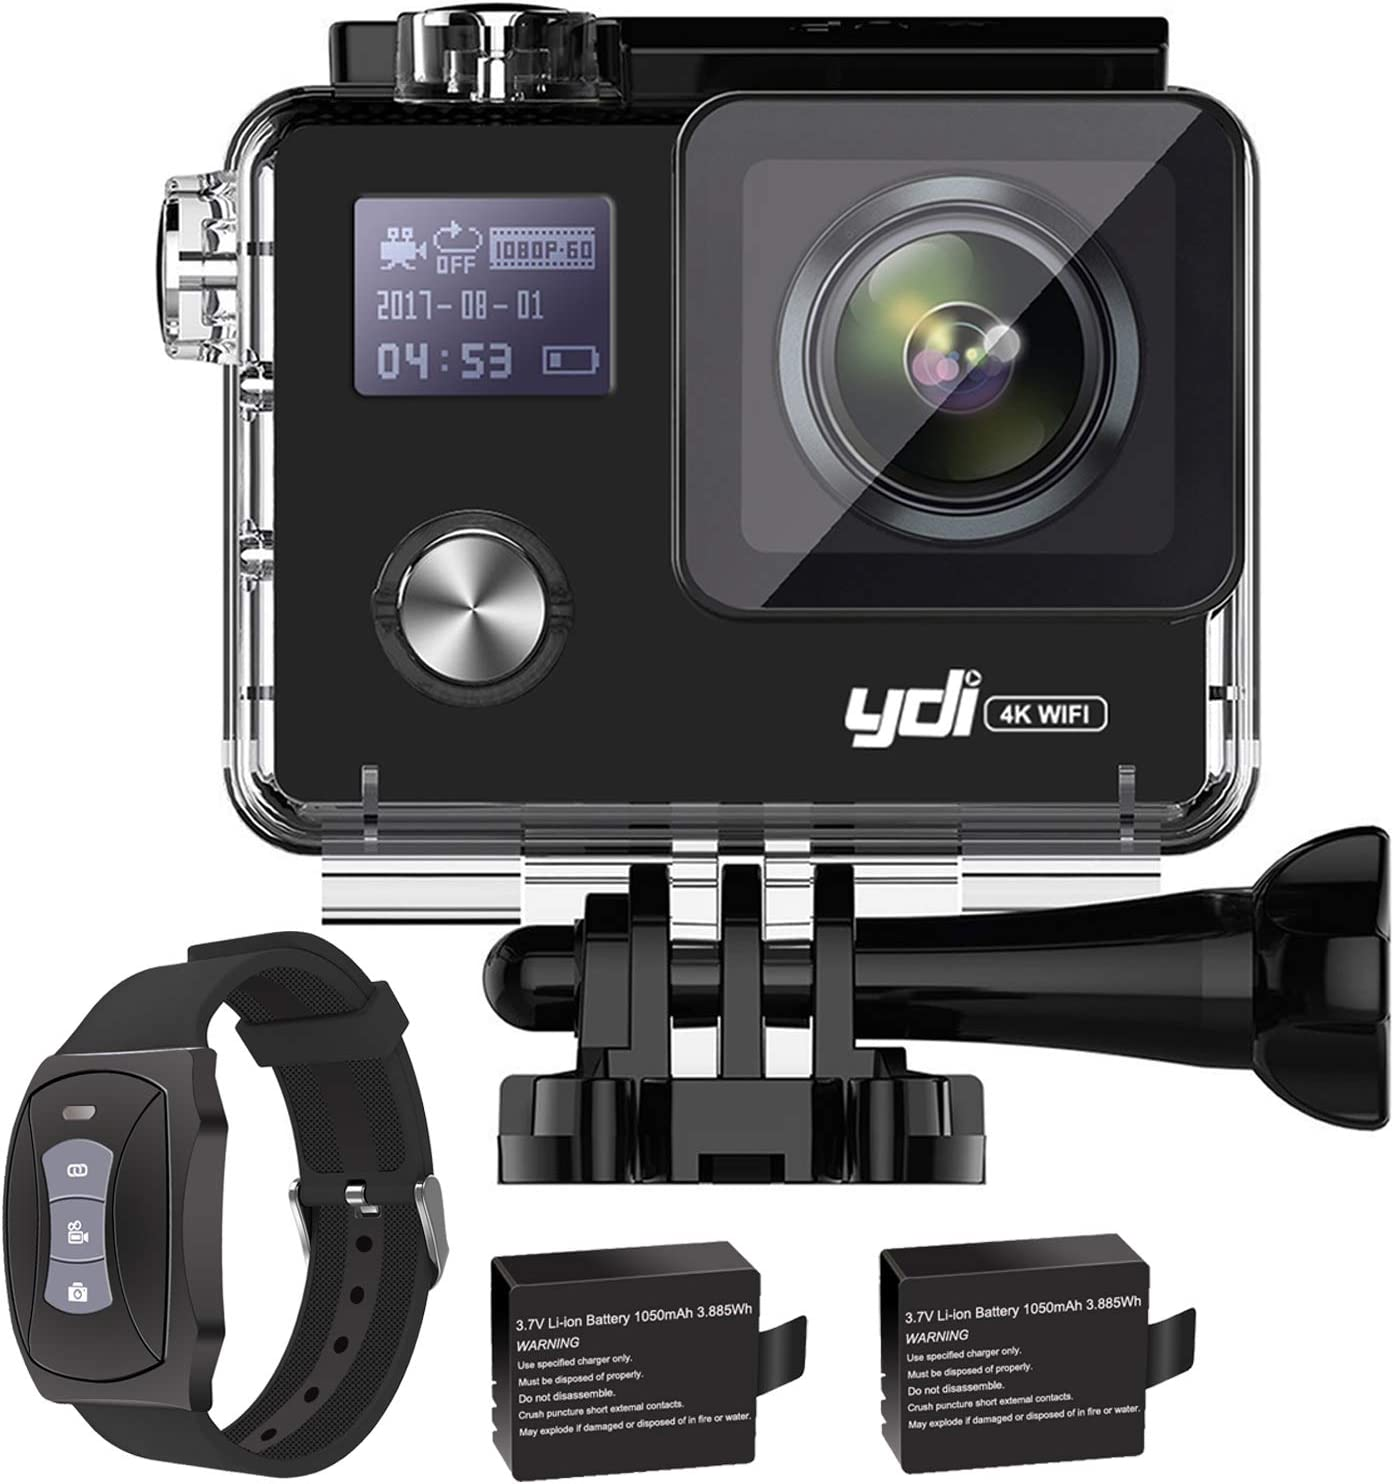 Ydi G80 Action Cam 4k Wifi Underwater Camera Gyro Elektronik